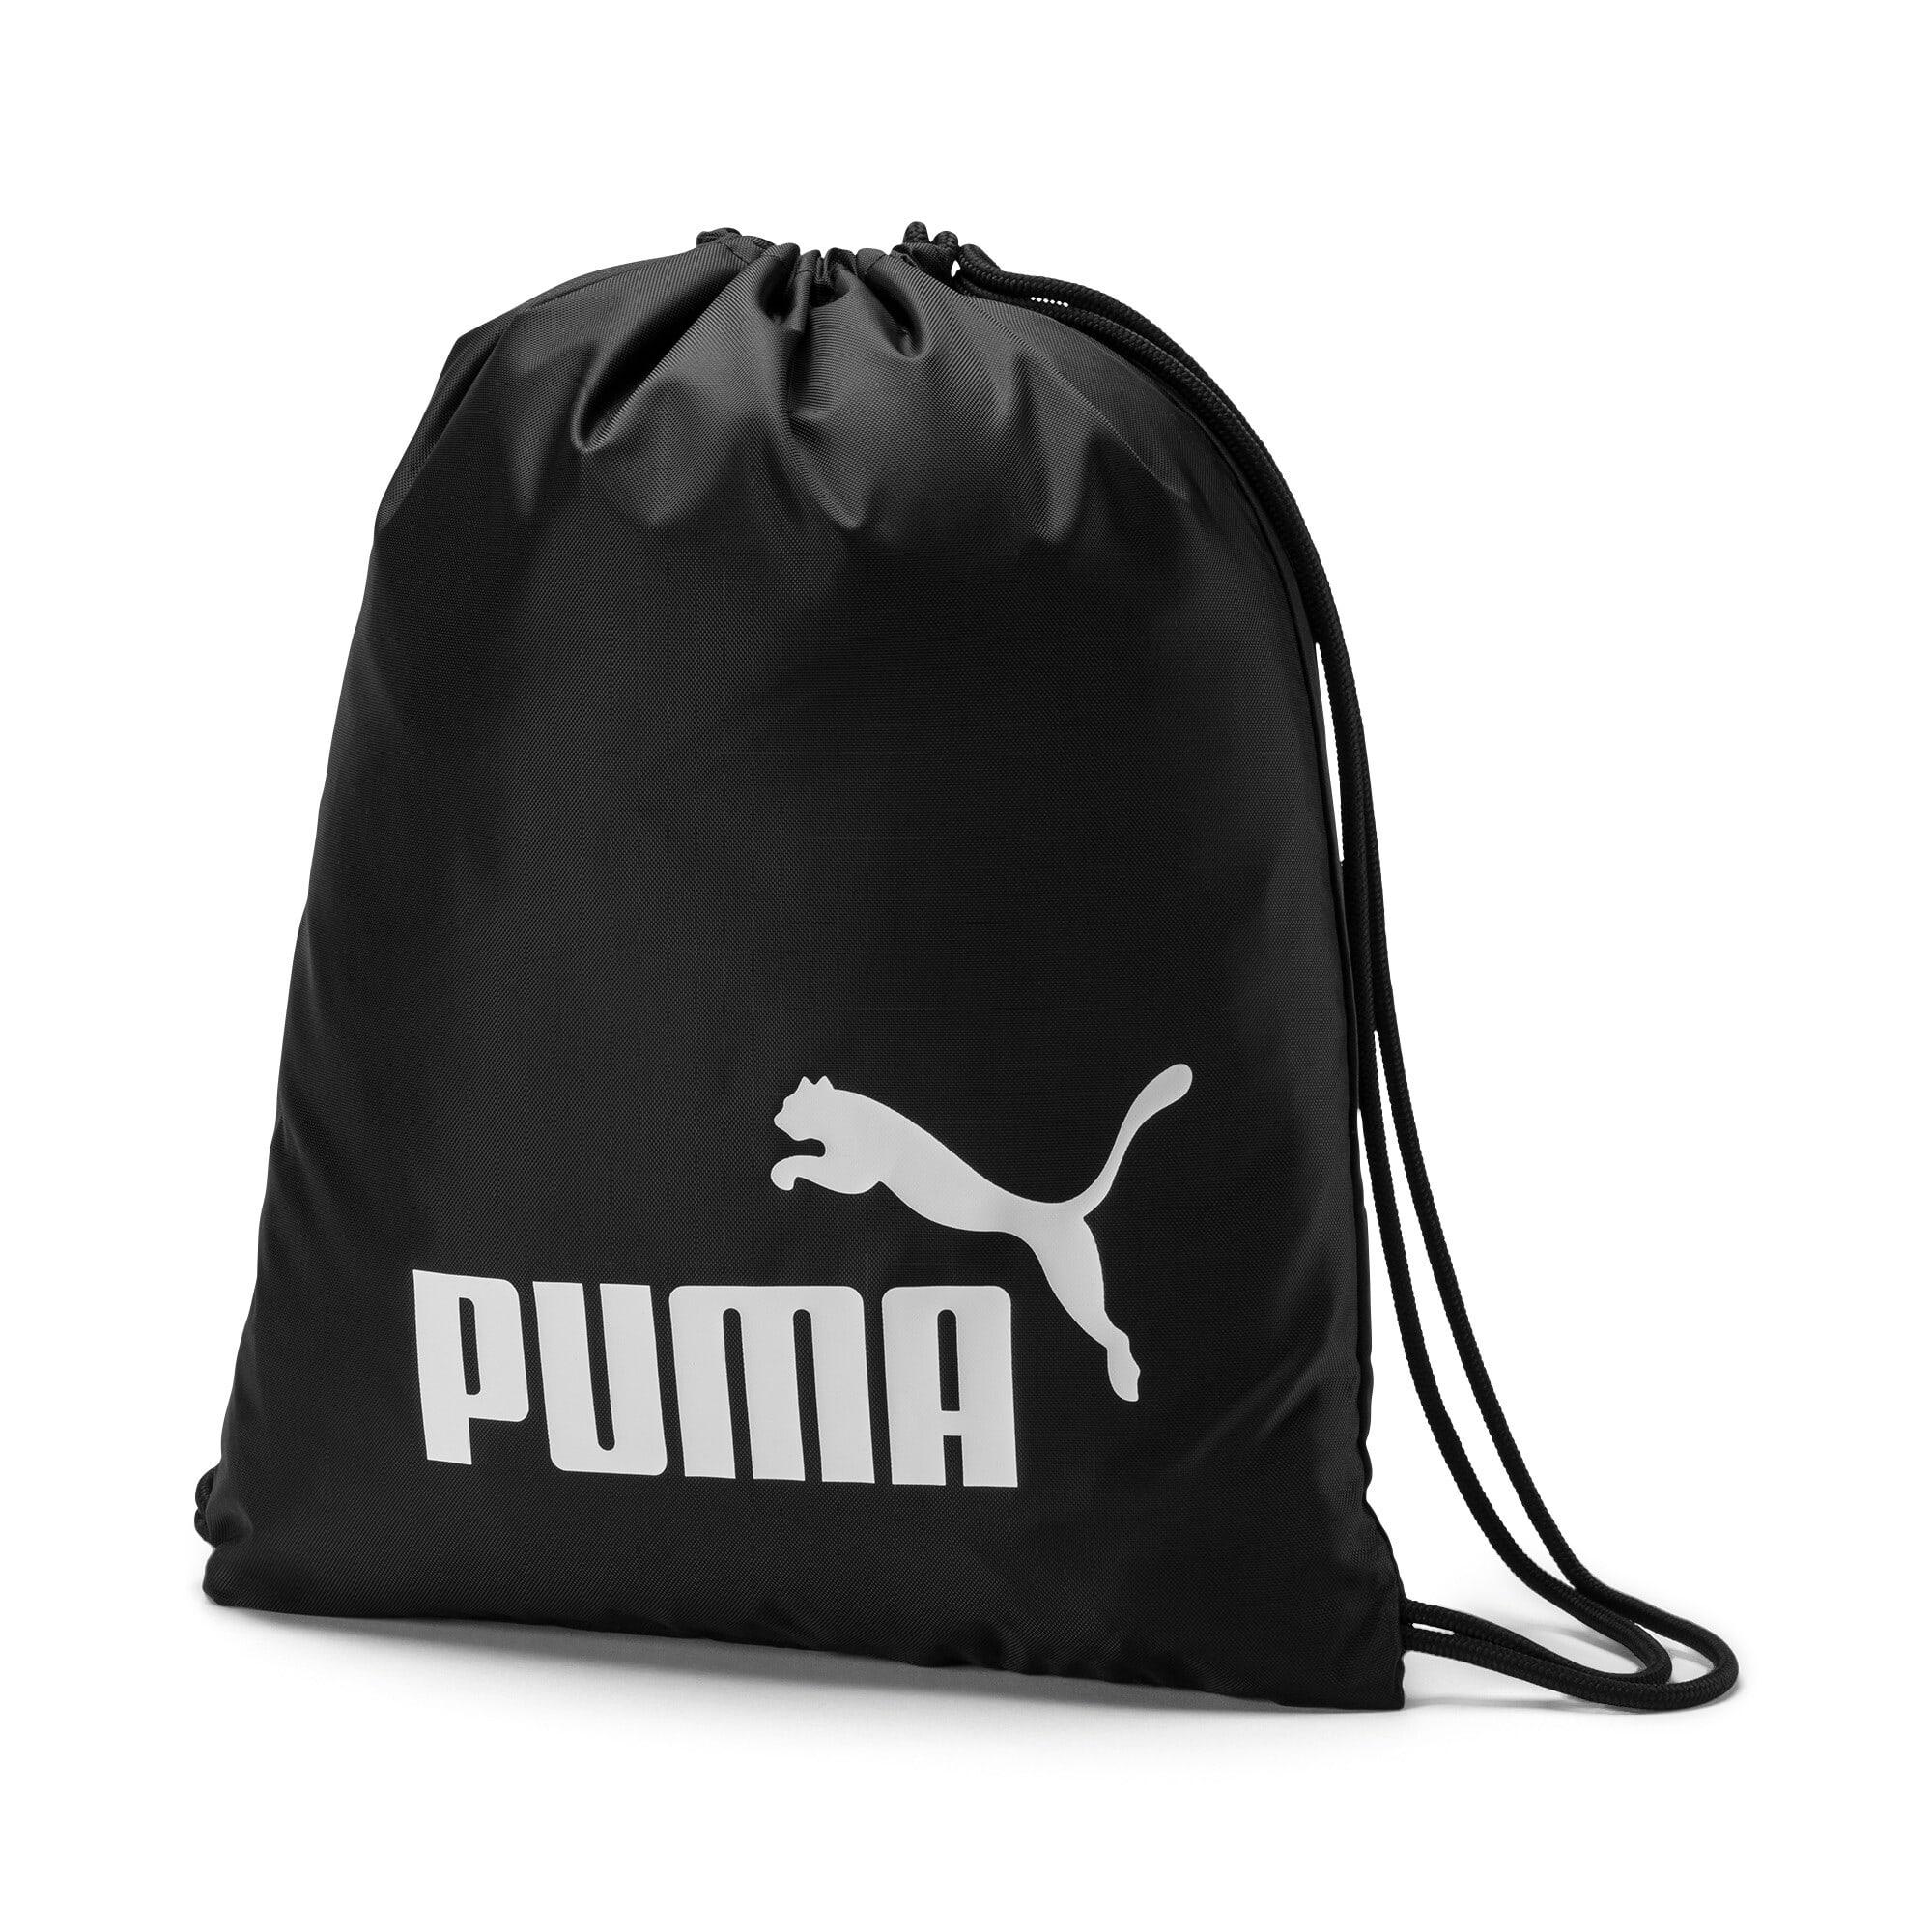 Thumbnail 1 of Classic Gym Sack, Puma Black, medium